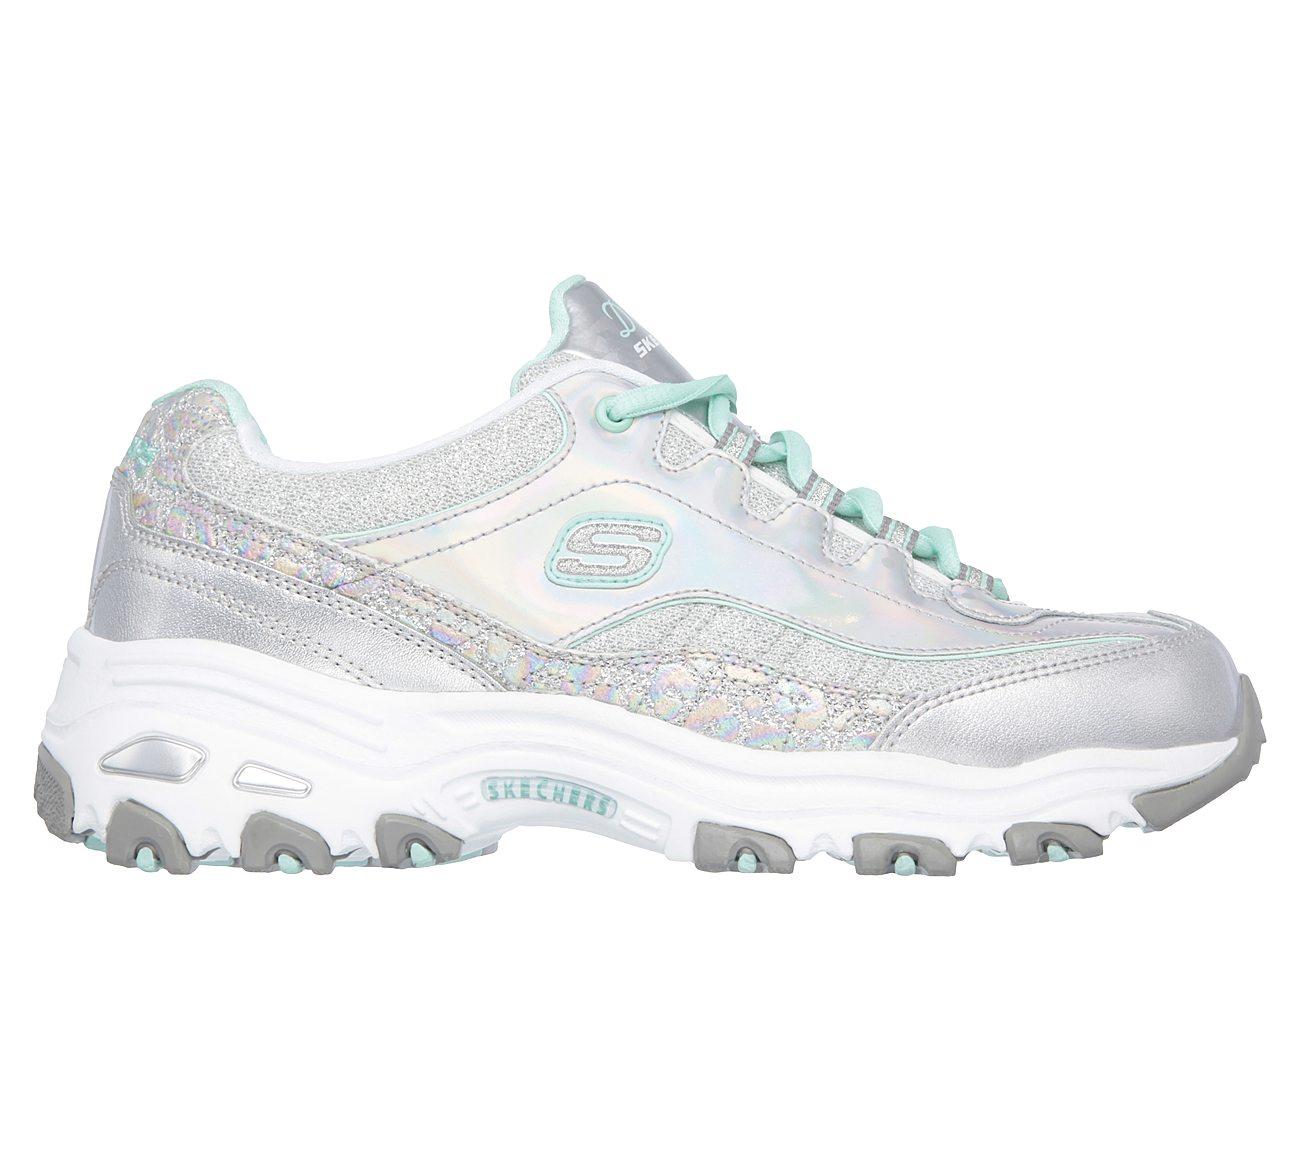 skechers silver shoes